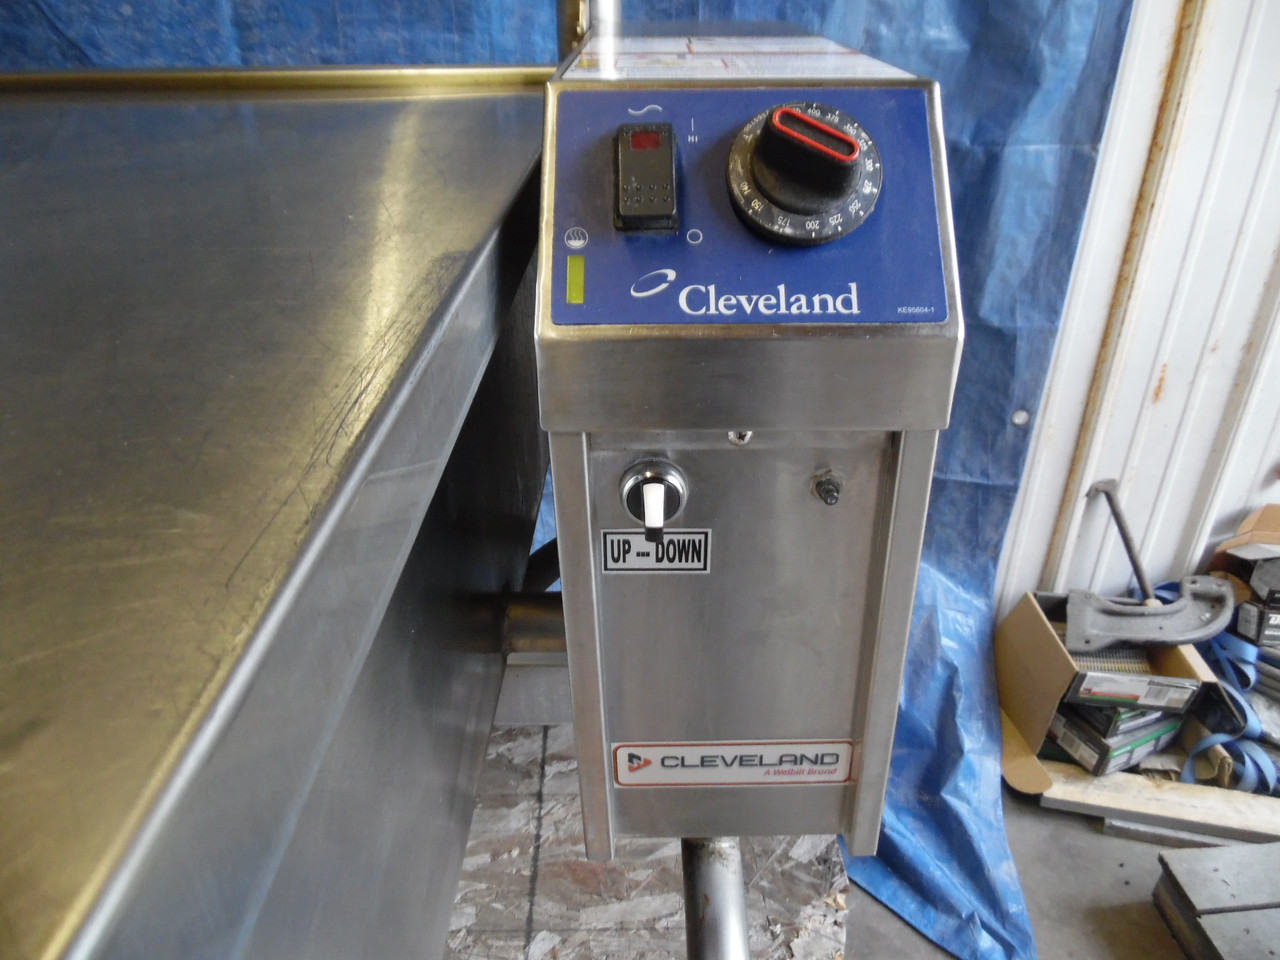 Cleveland SEL40T1 Electric Auto Tilt Braising Pan Skillet